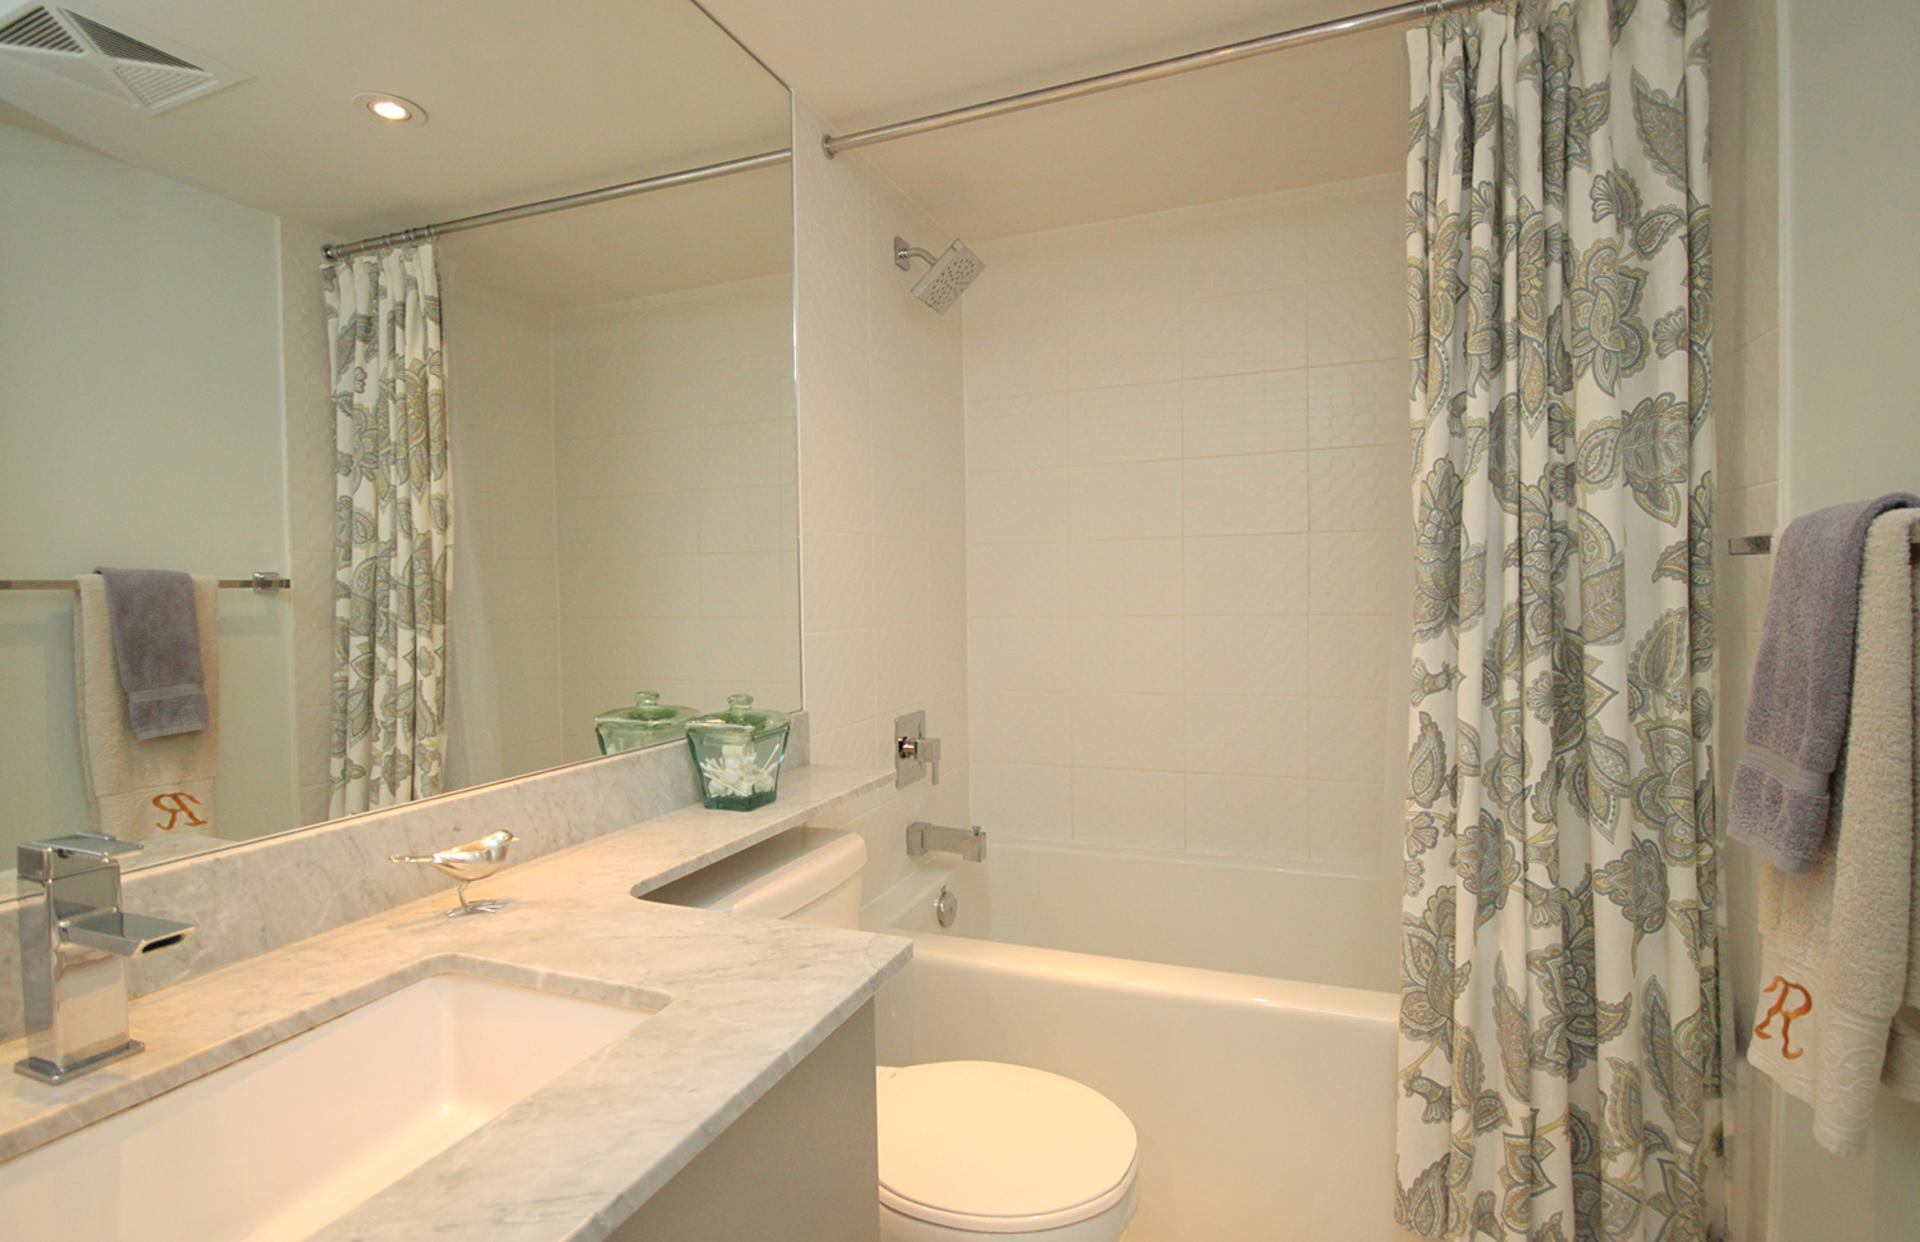 4 Piece Bathroom at 421 - 75 East Liberty Street, Niagara, Toronto